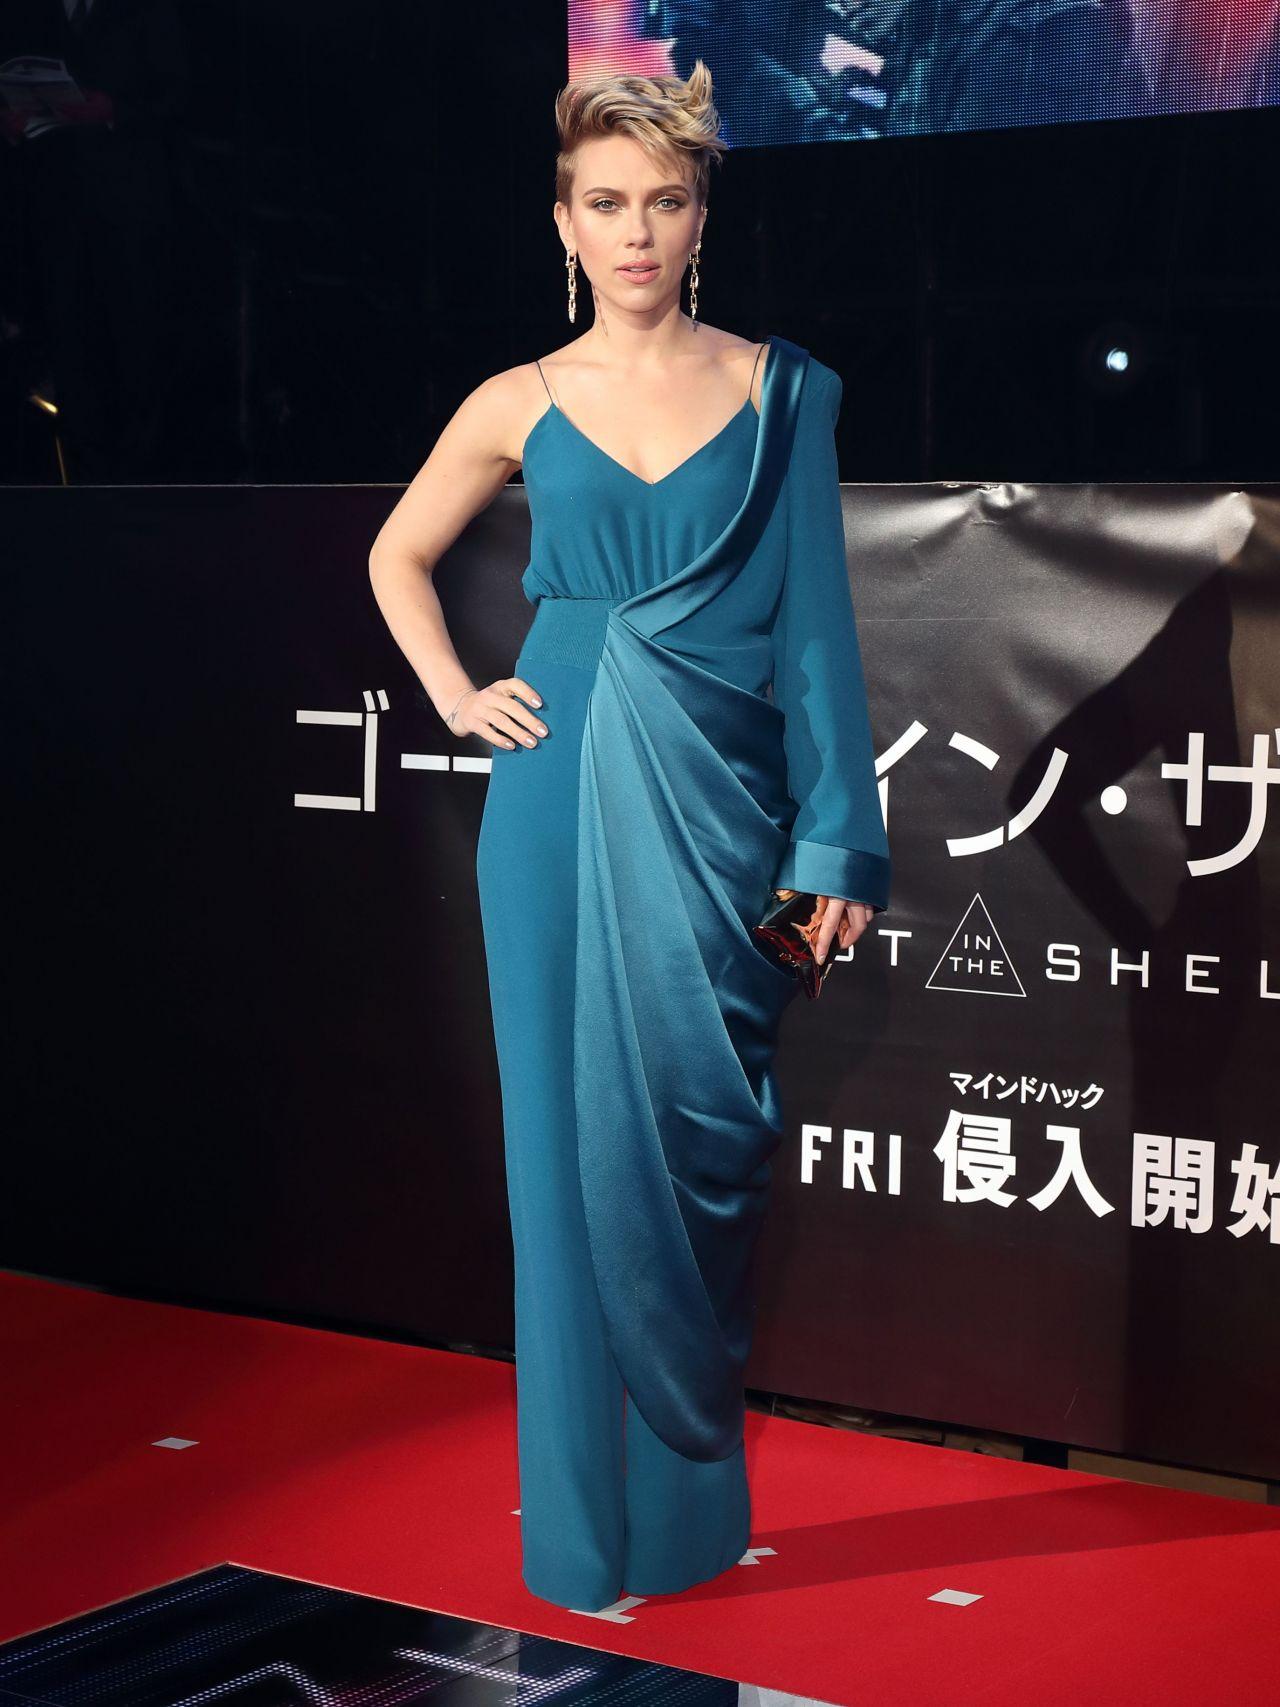 Scarlett Johansson Ghost In The Shell Red Carpet In Tokyo 3 16 2017 Celebmafia